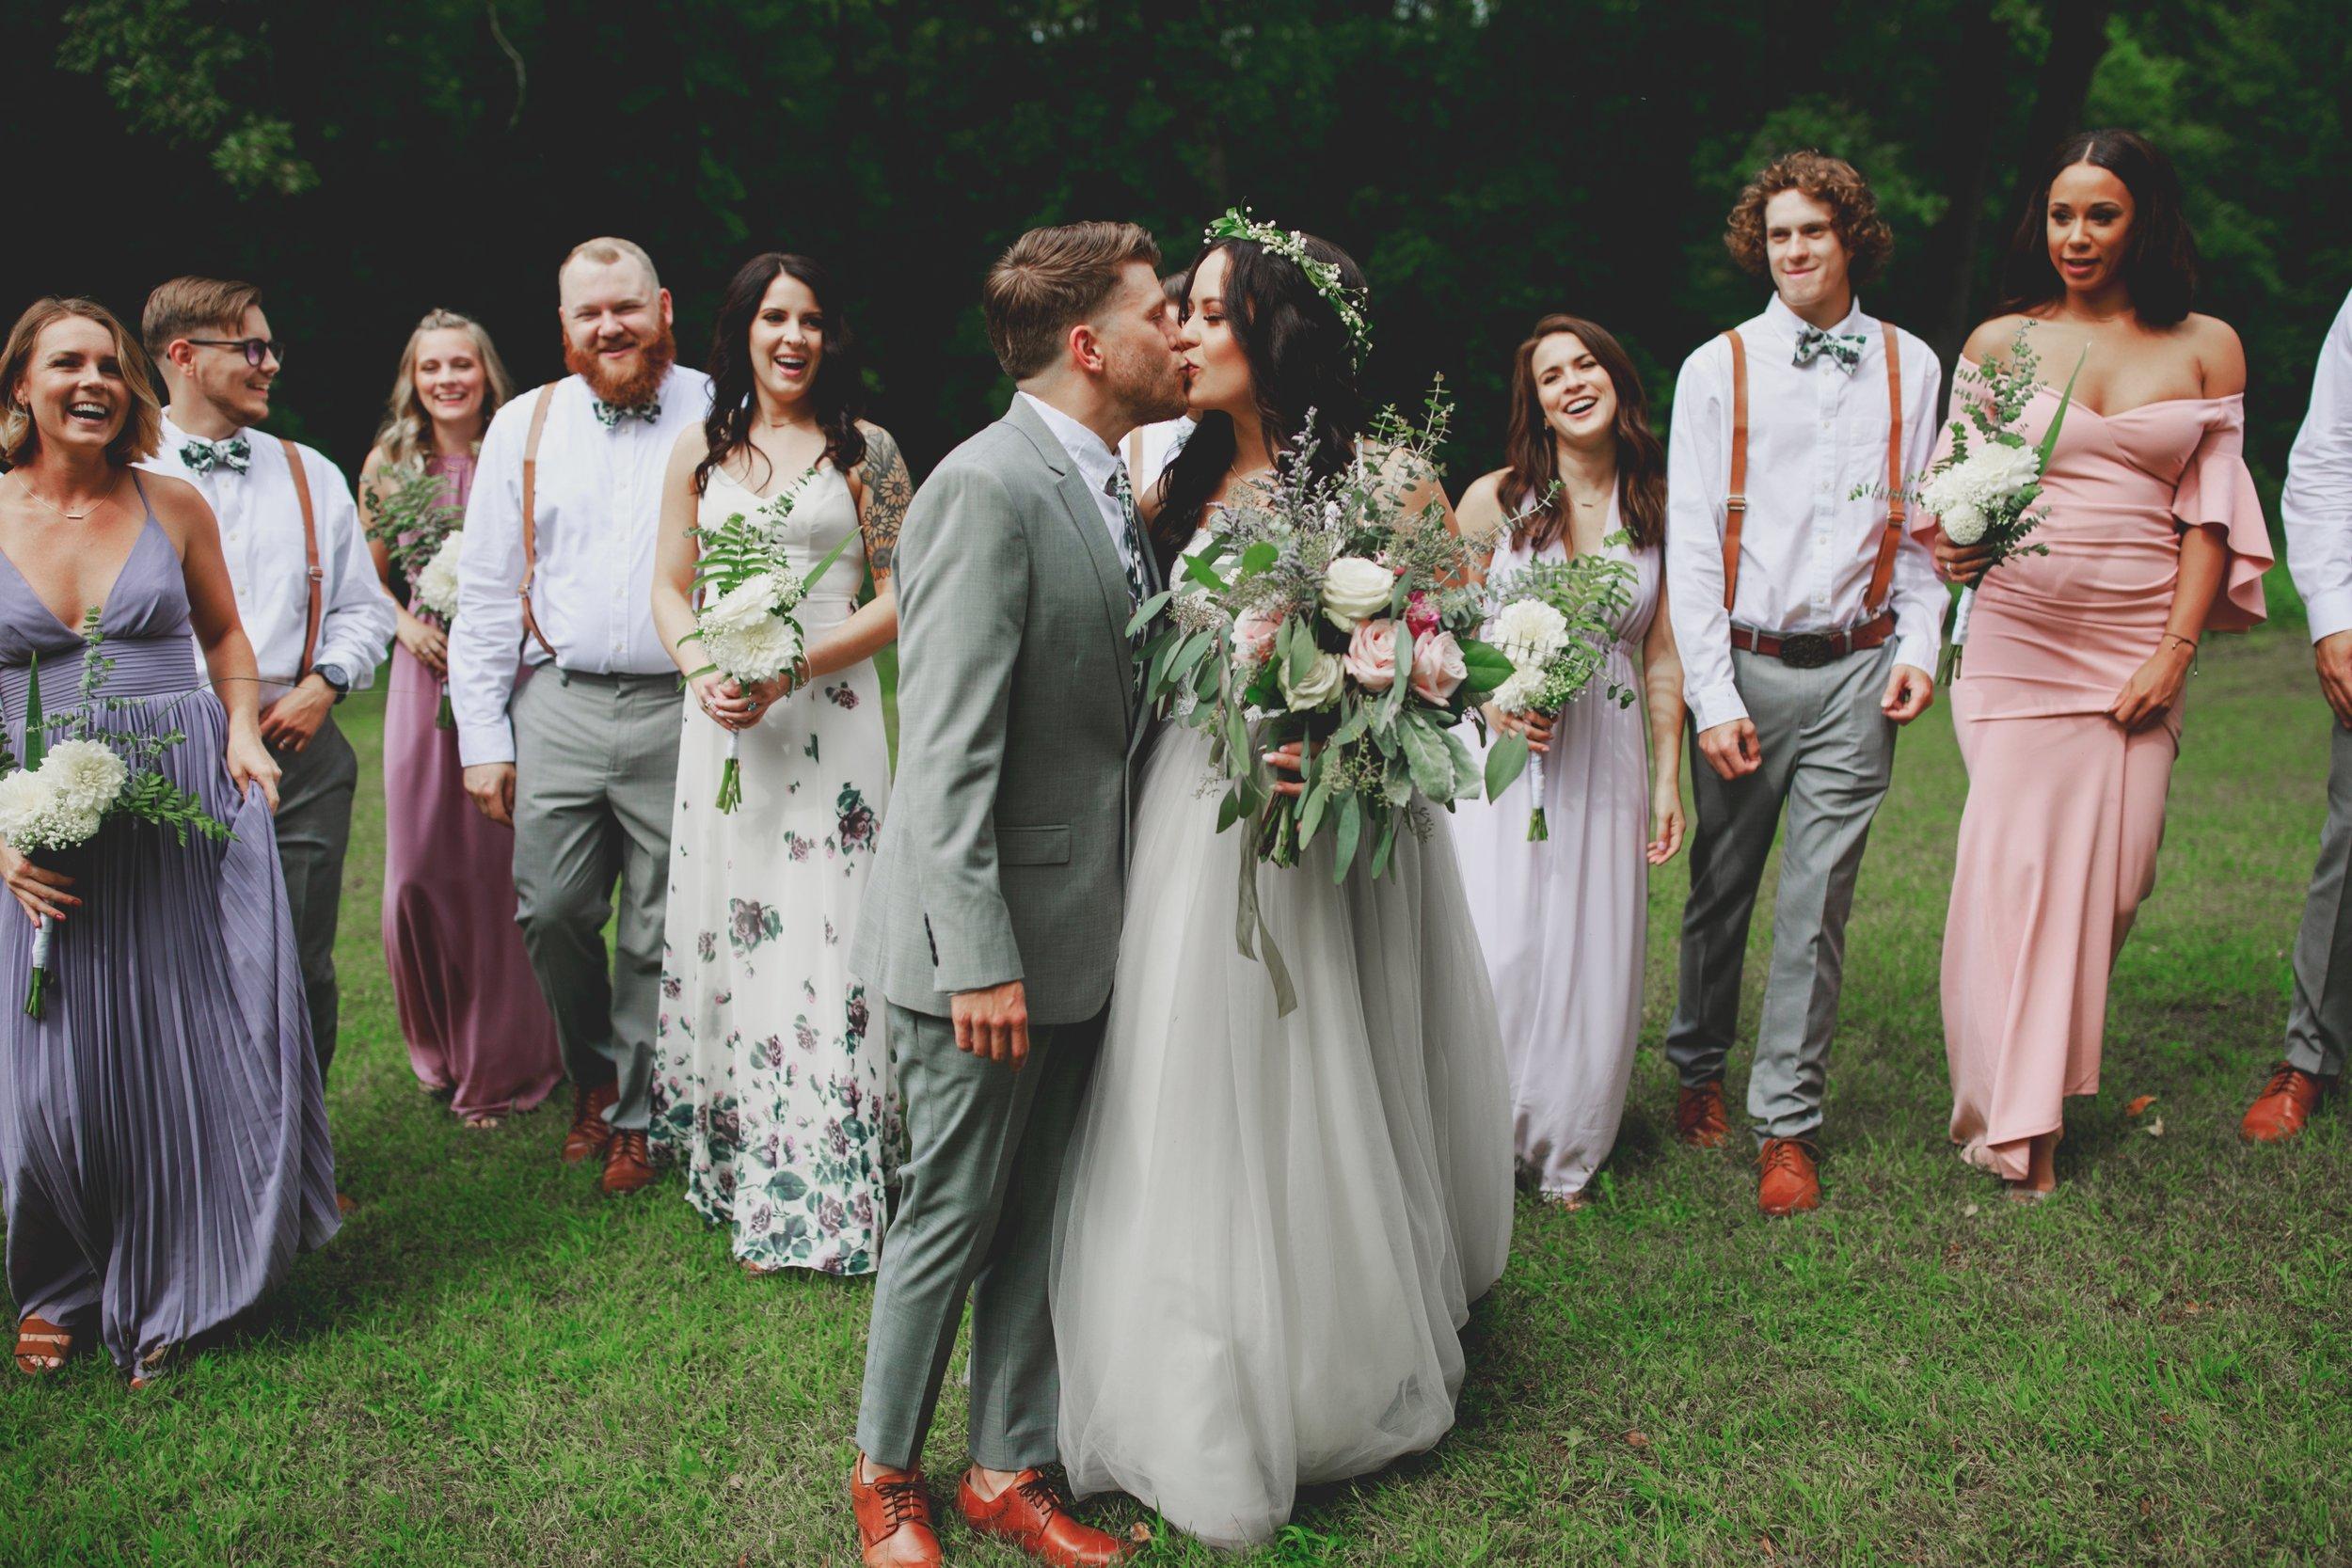 amanda_vanvels_michigan_camp_wedding_056.jpg